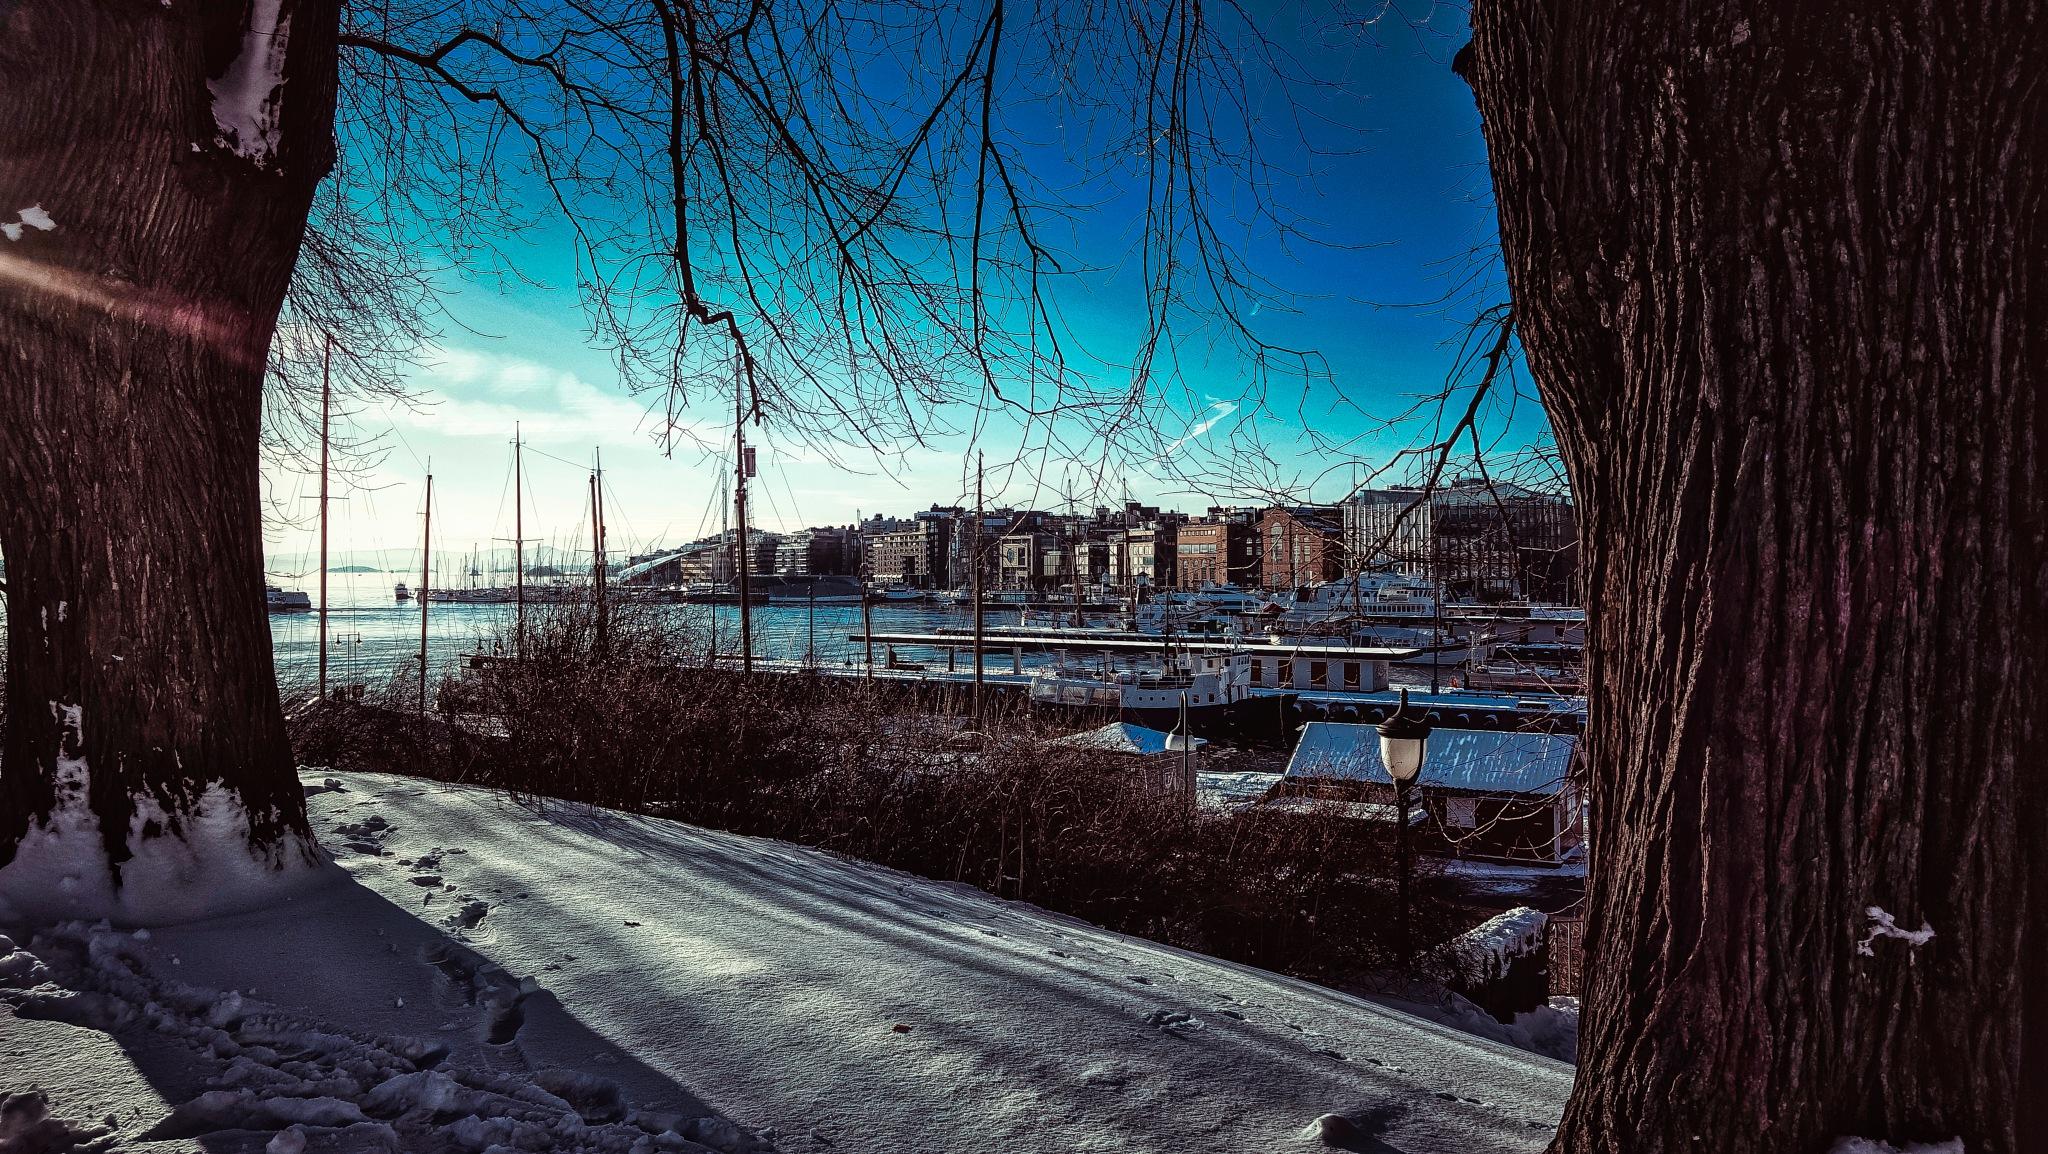 Winter at Oslo fjord  by Goran Jorganovich